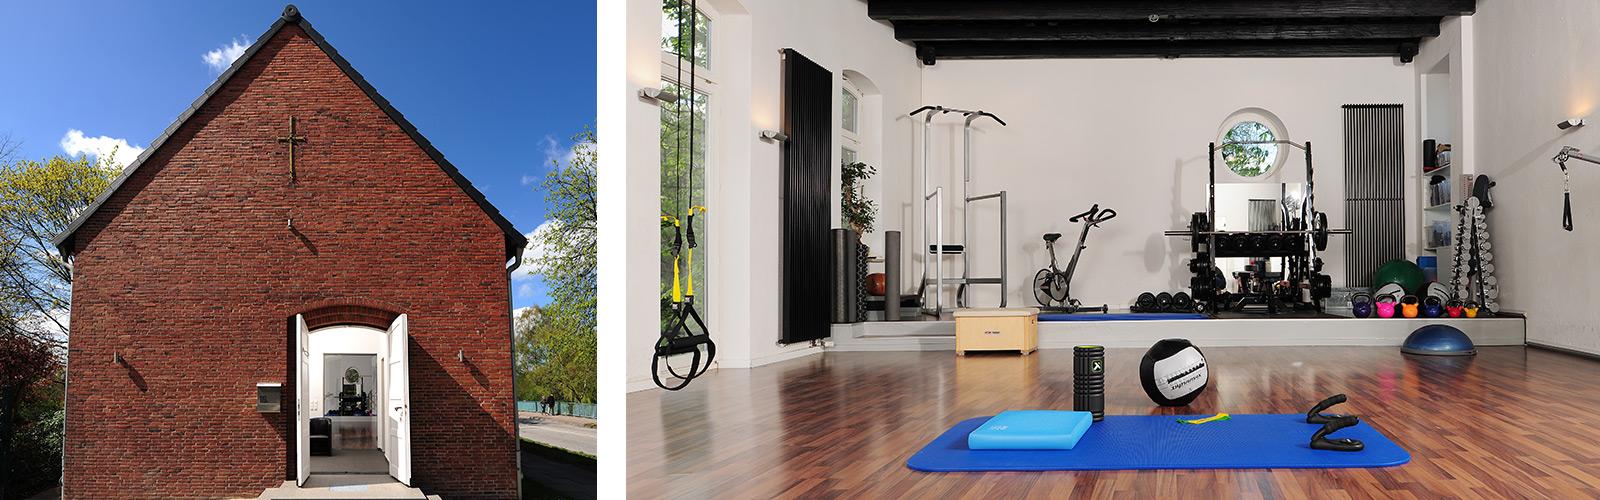 Personal Trainer Studio Hamburg